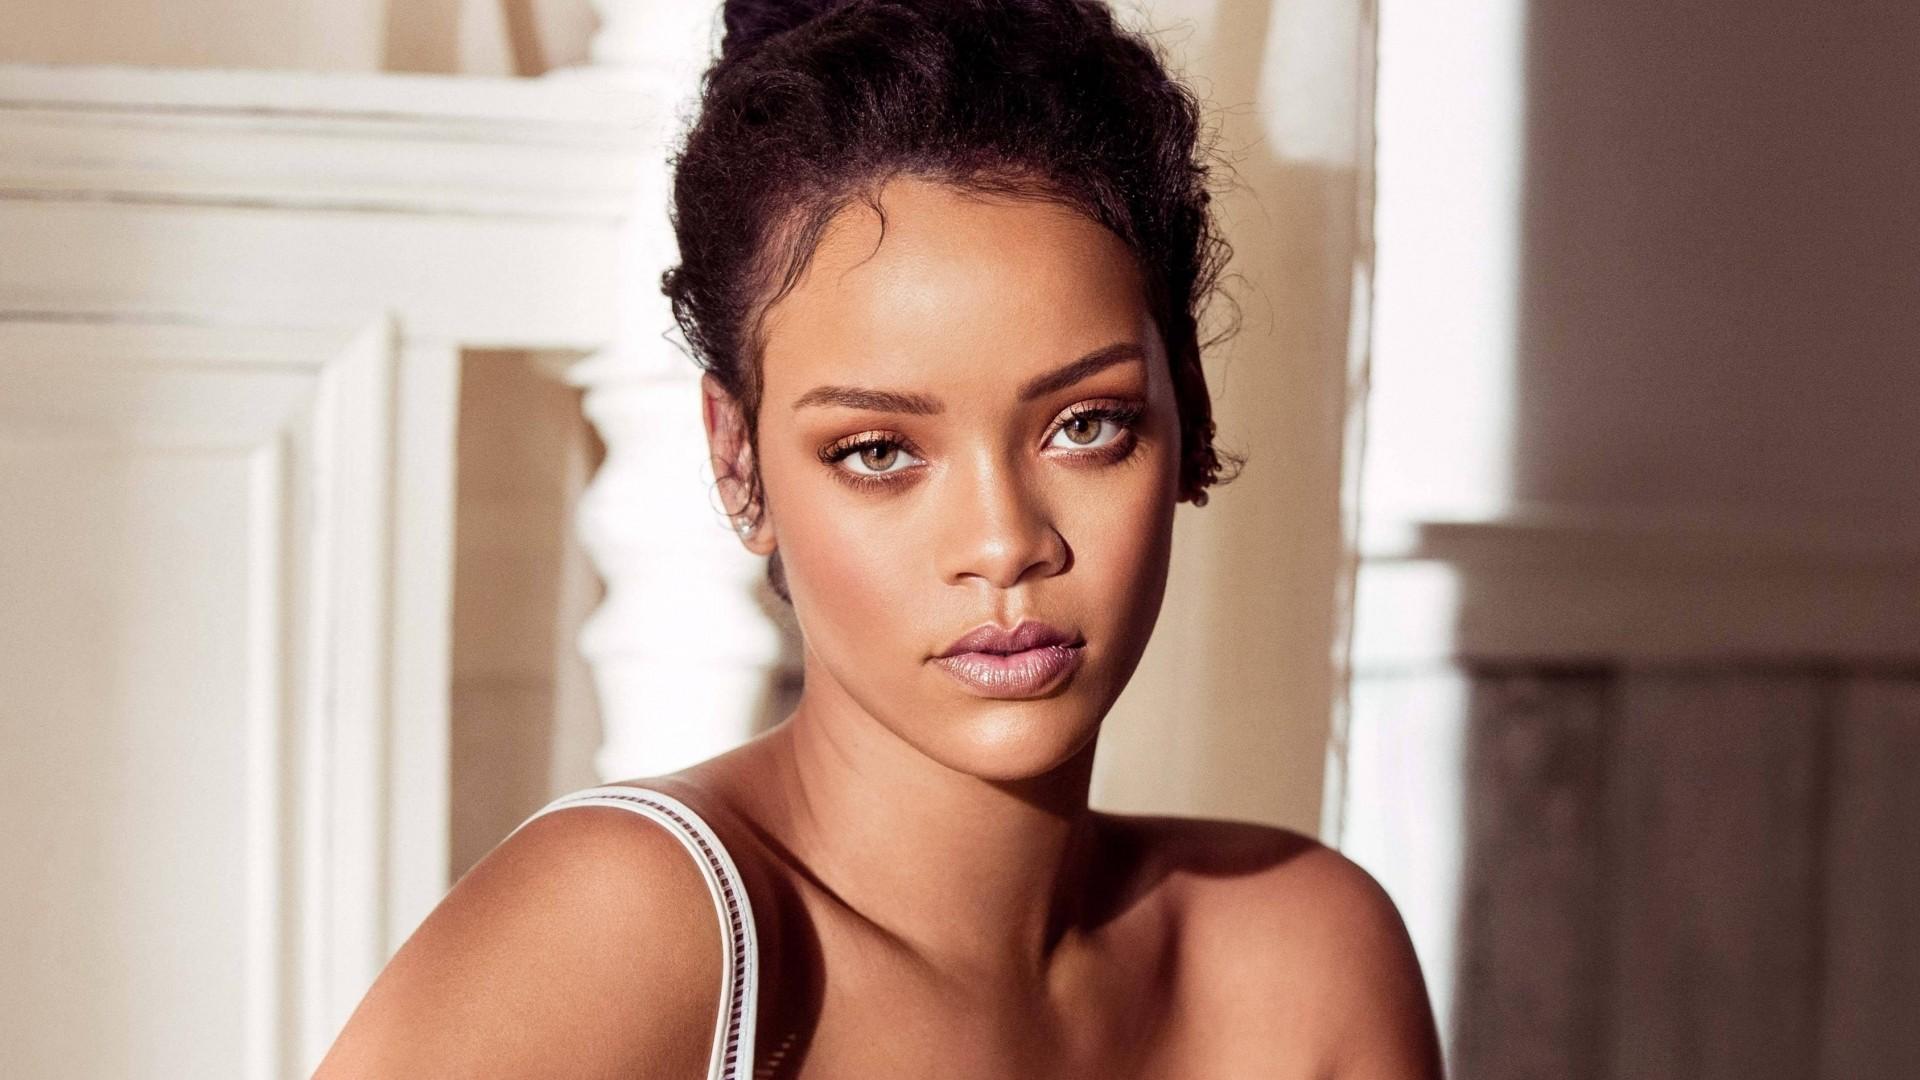 Rihanna hd desktop wallpaper